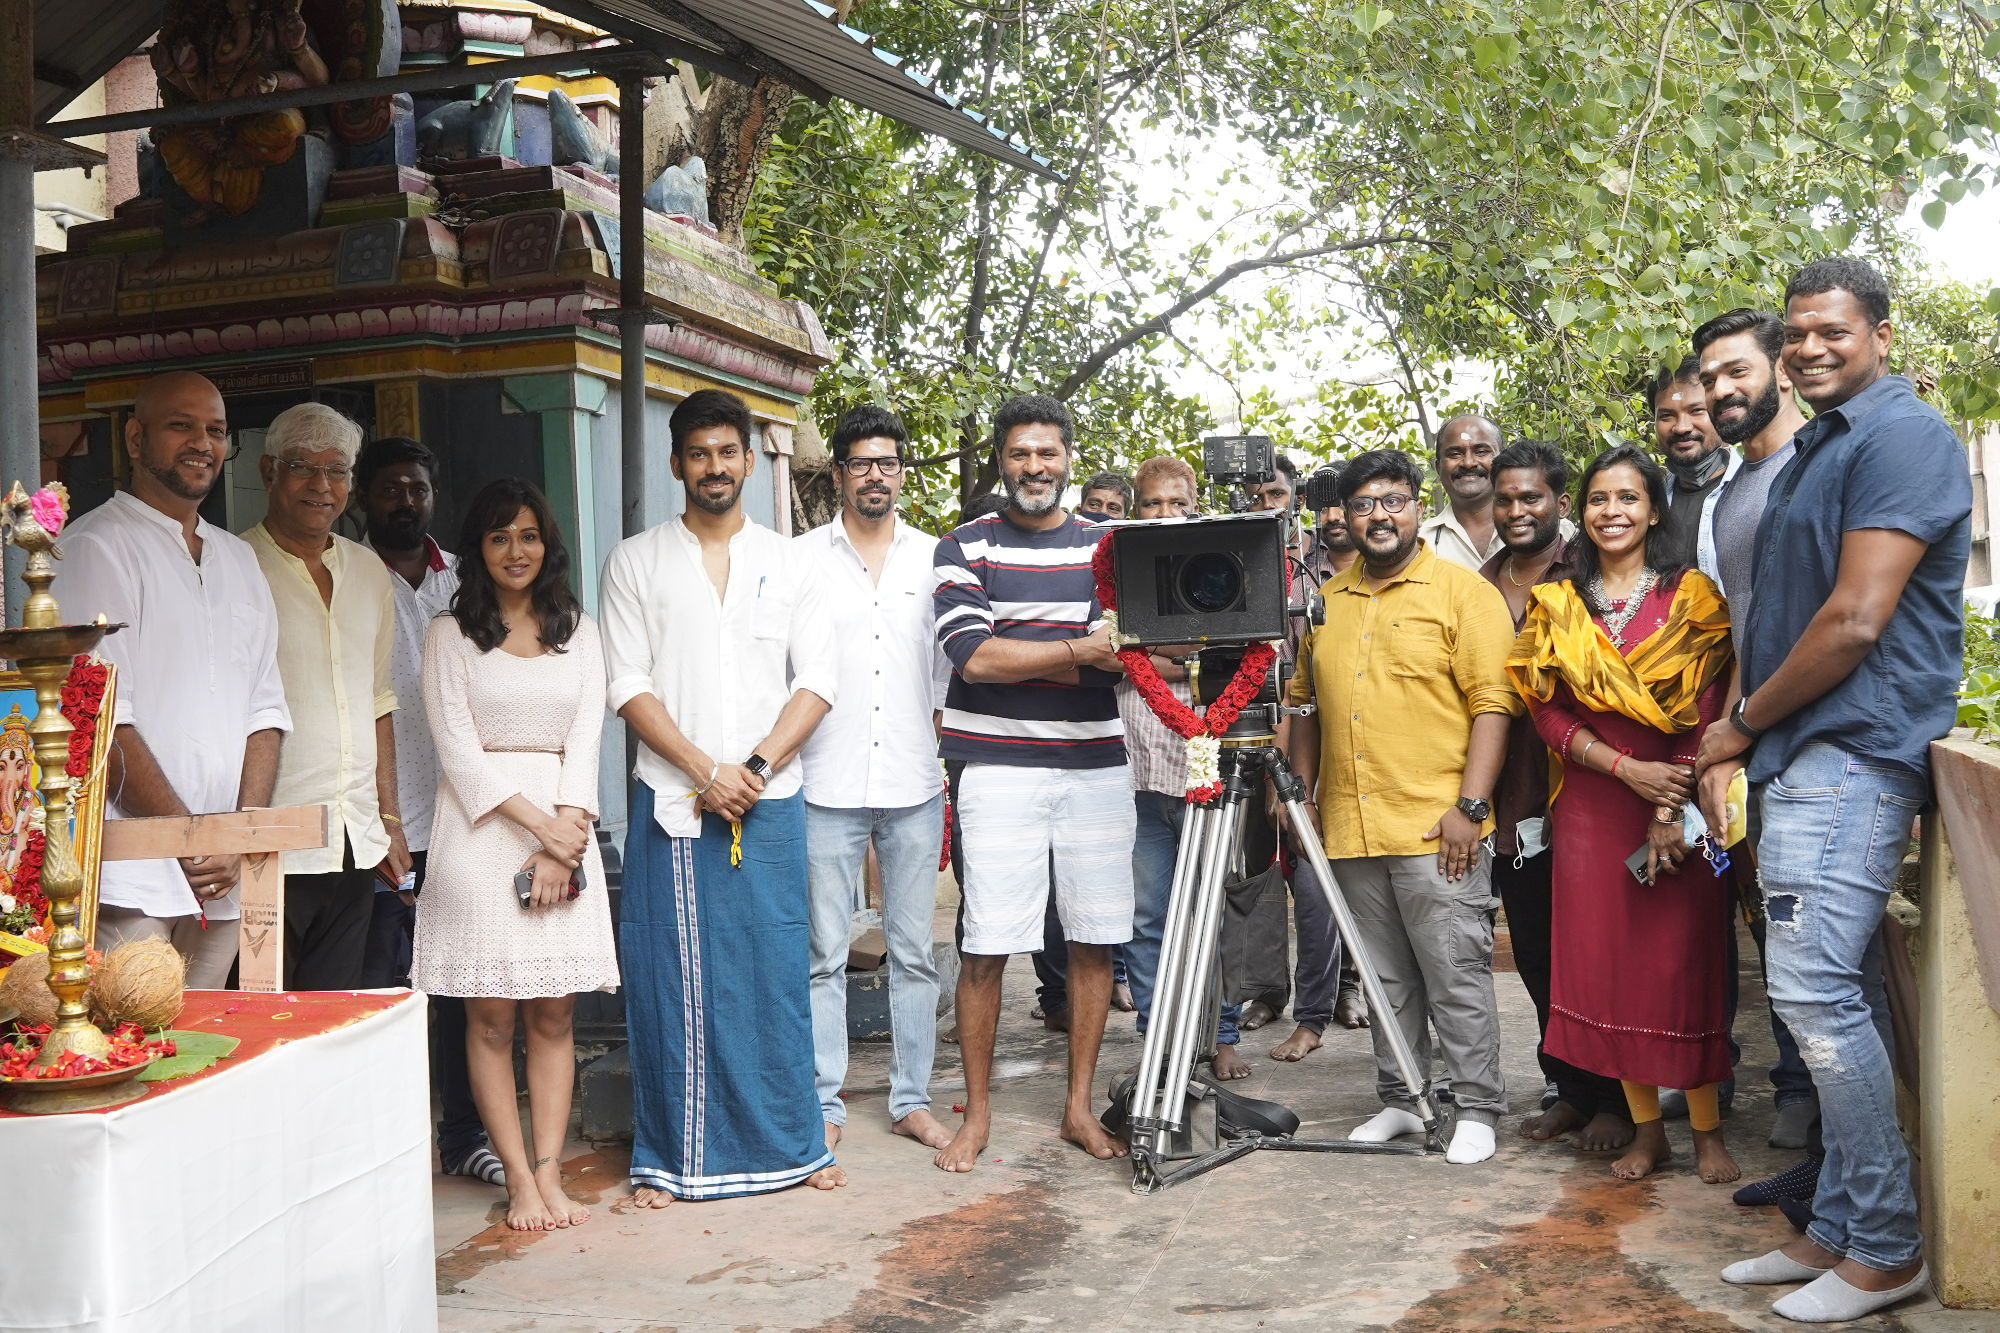 Actor Prabhu Deva Director Santhosh P Jayakumar untitled film to go on floors